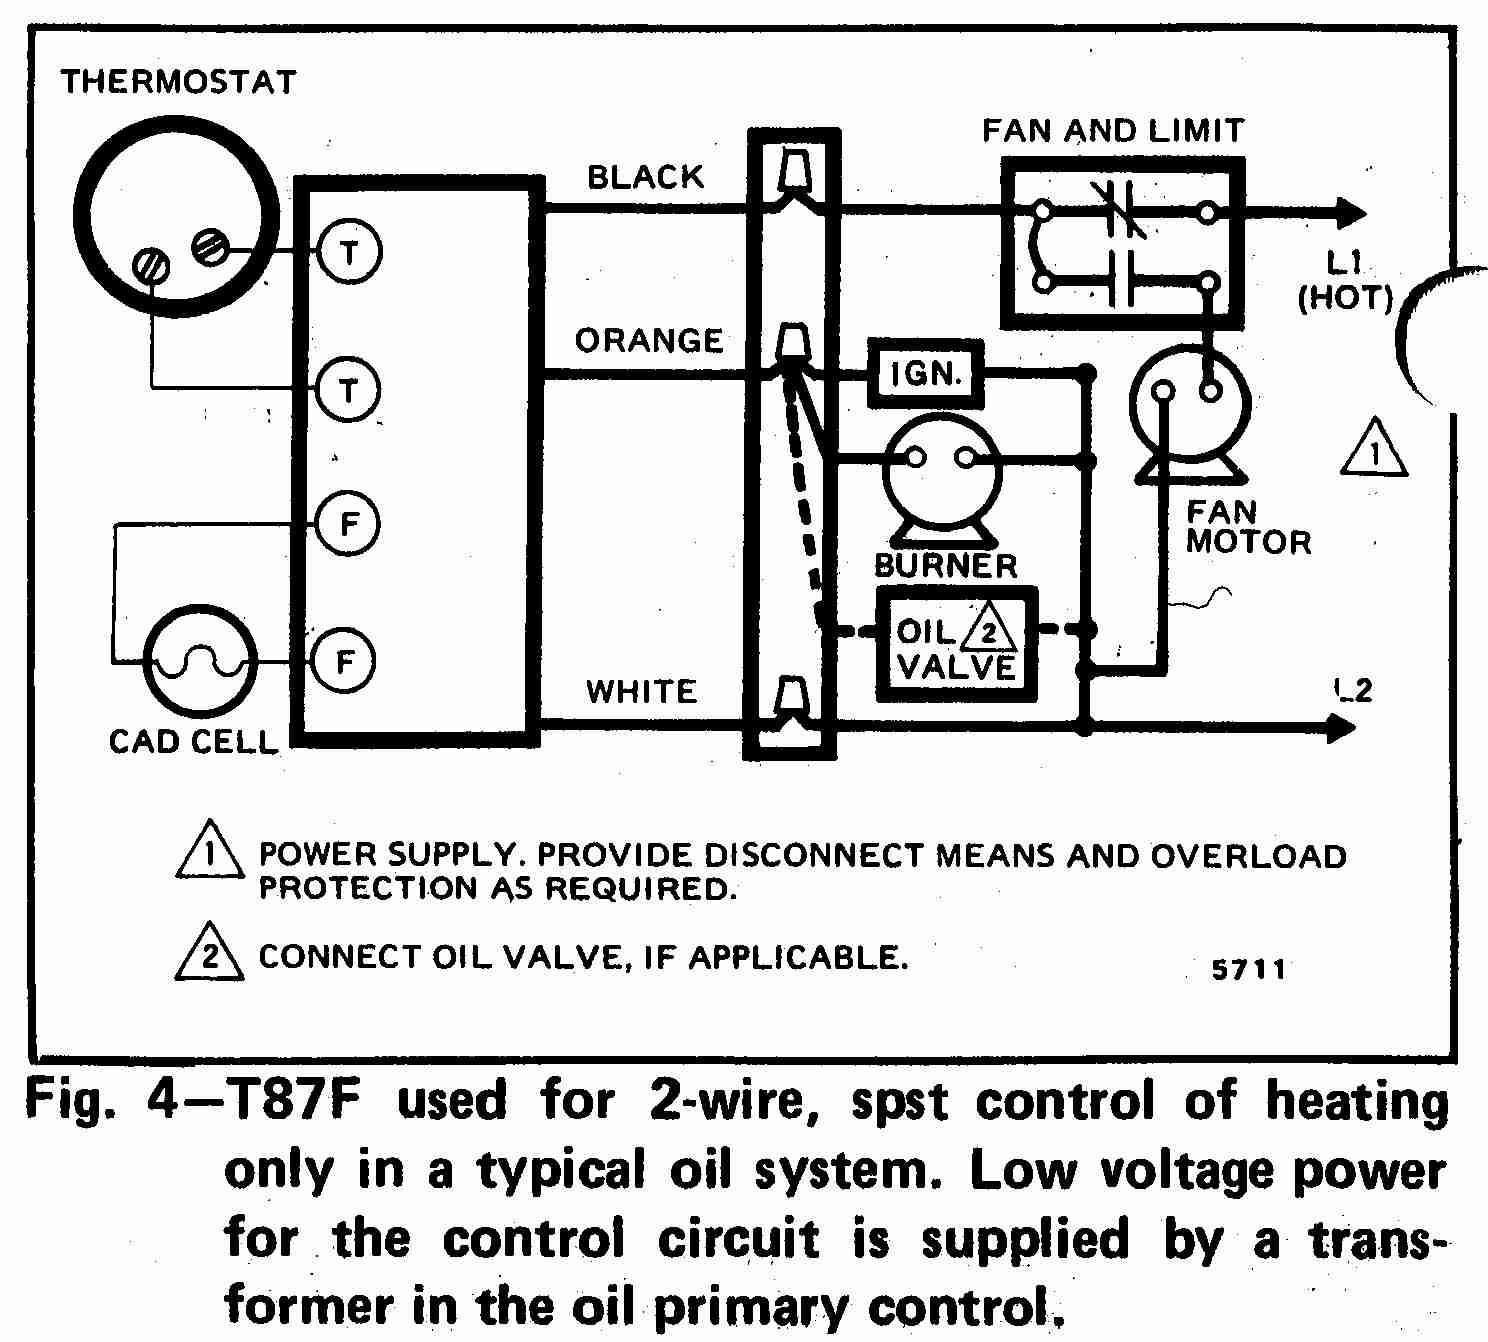 Honeywell Thermostat Low Voltage Wiring Diagram - Wiring Diagram - Honeywell Thermostat Wiring Diagram